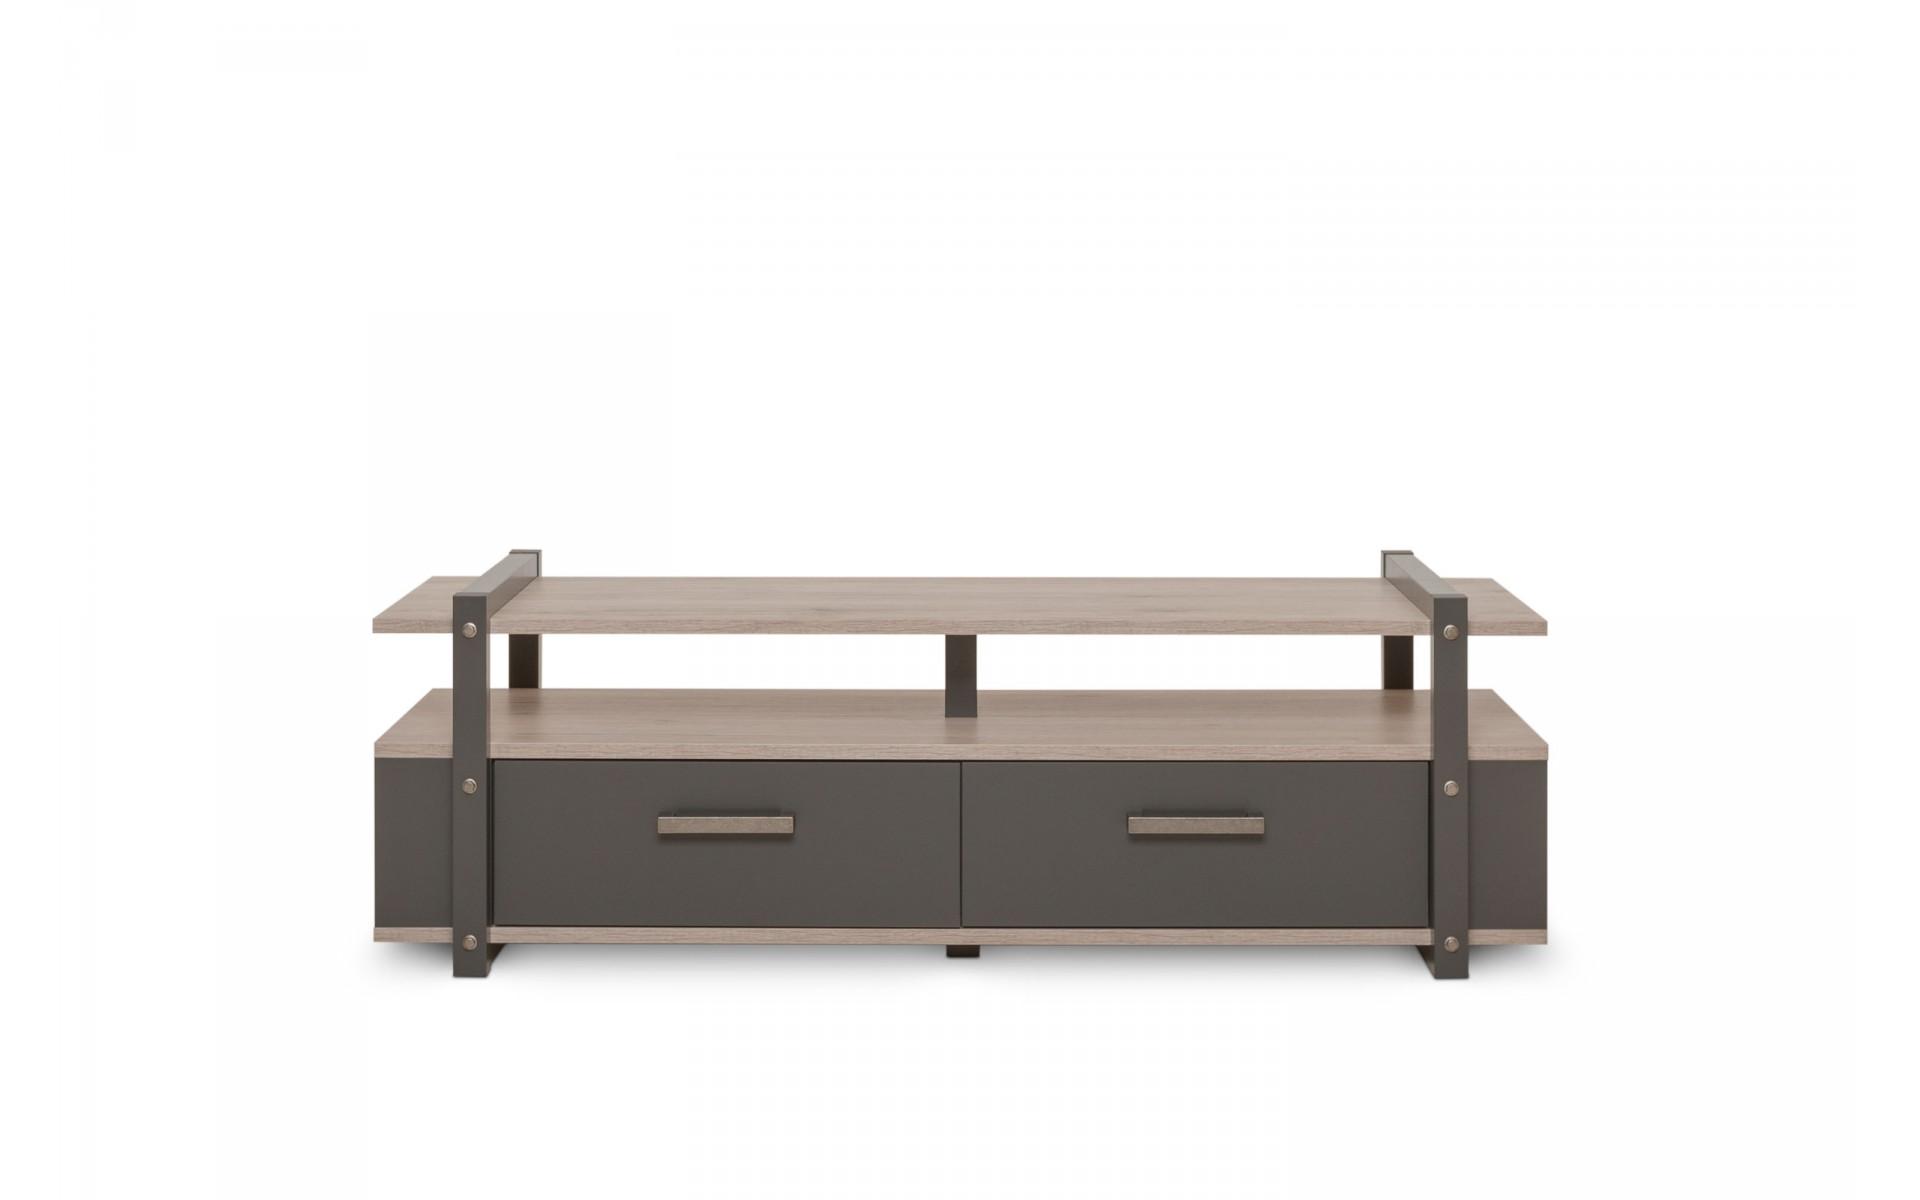 Meuble tv de style industriel brooklyn top d co - Top deco meuble ...